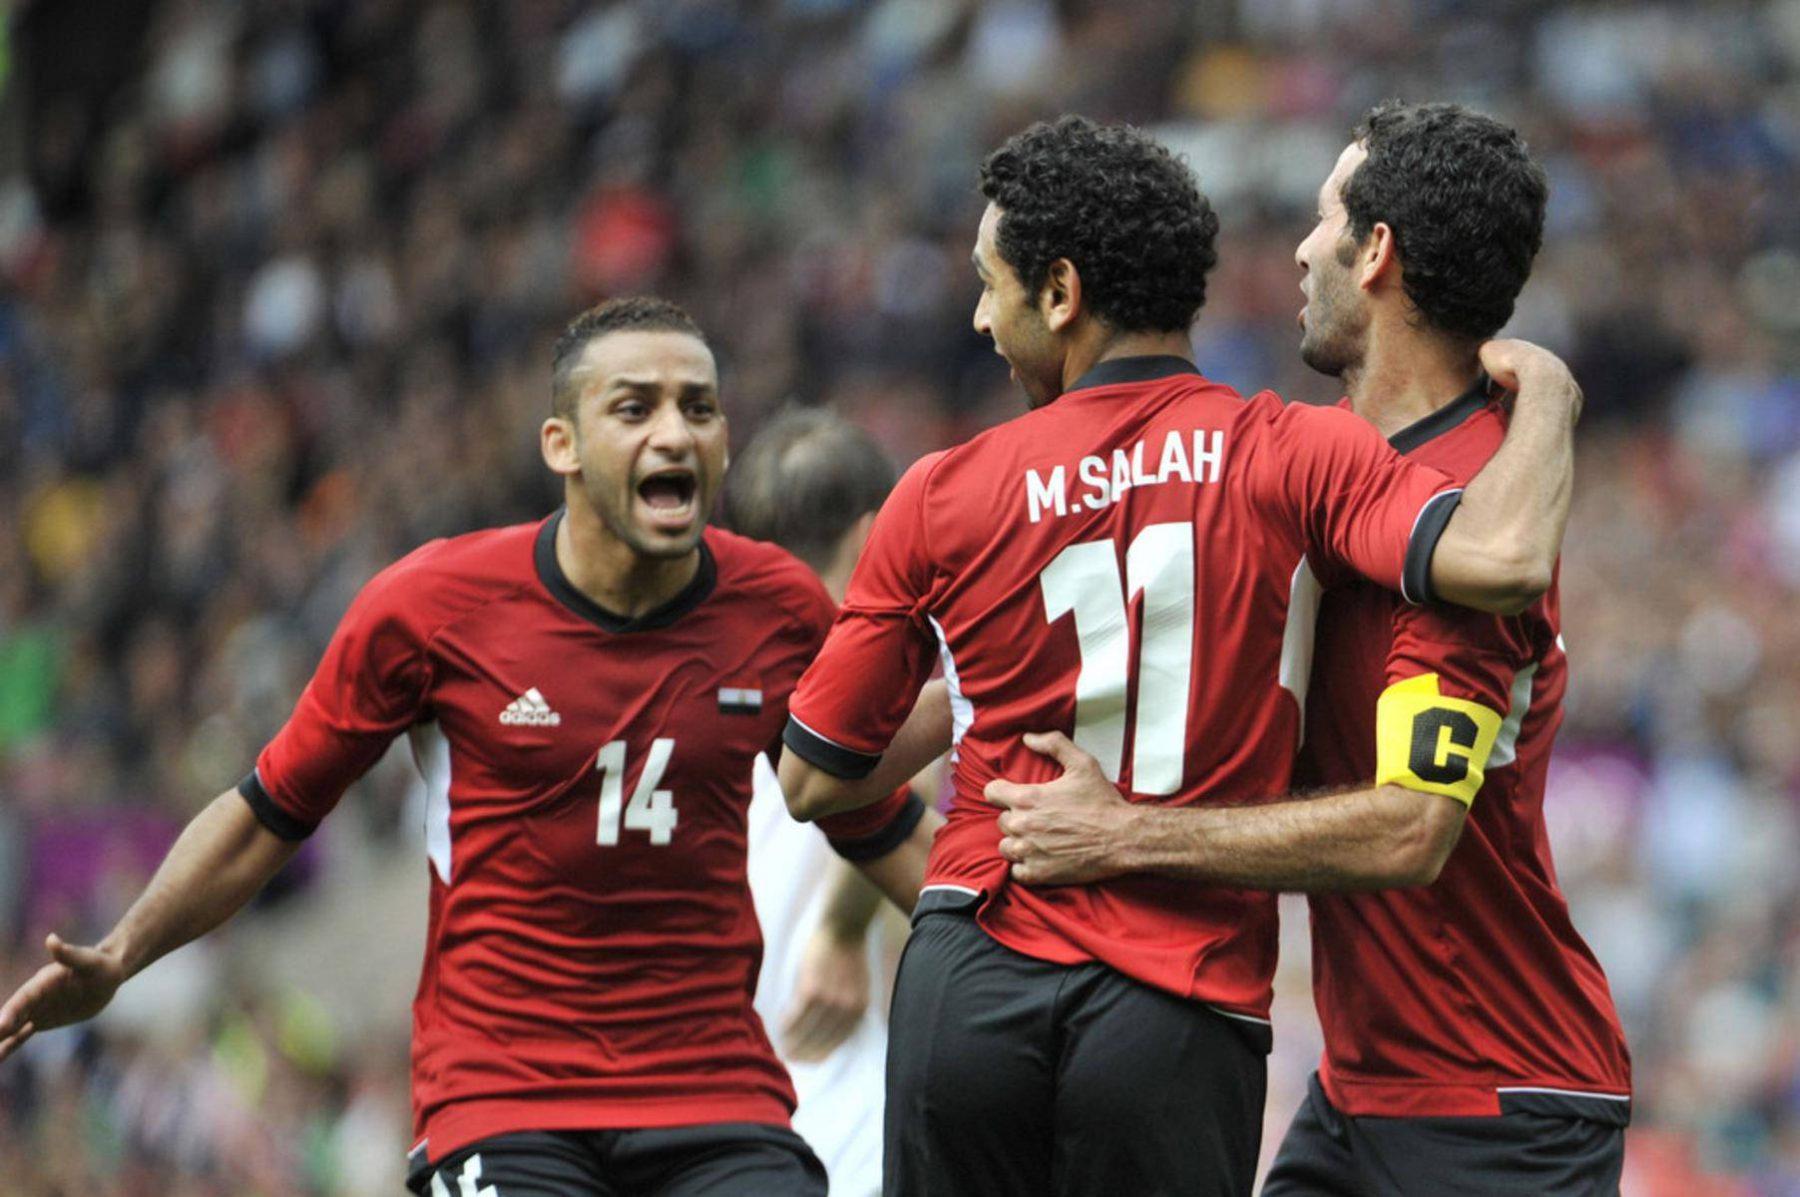 Mohamed Salah HD Wallpapers